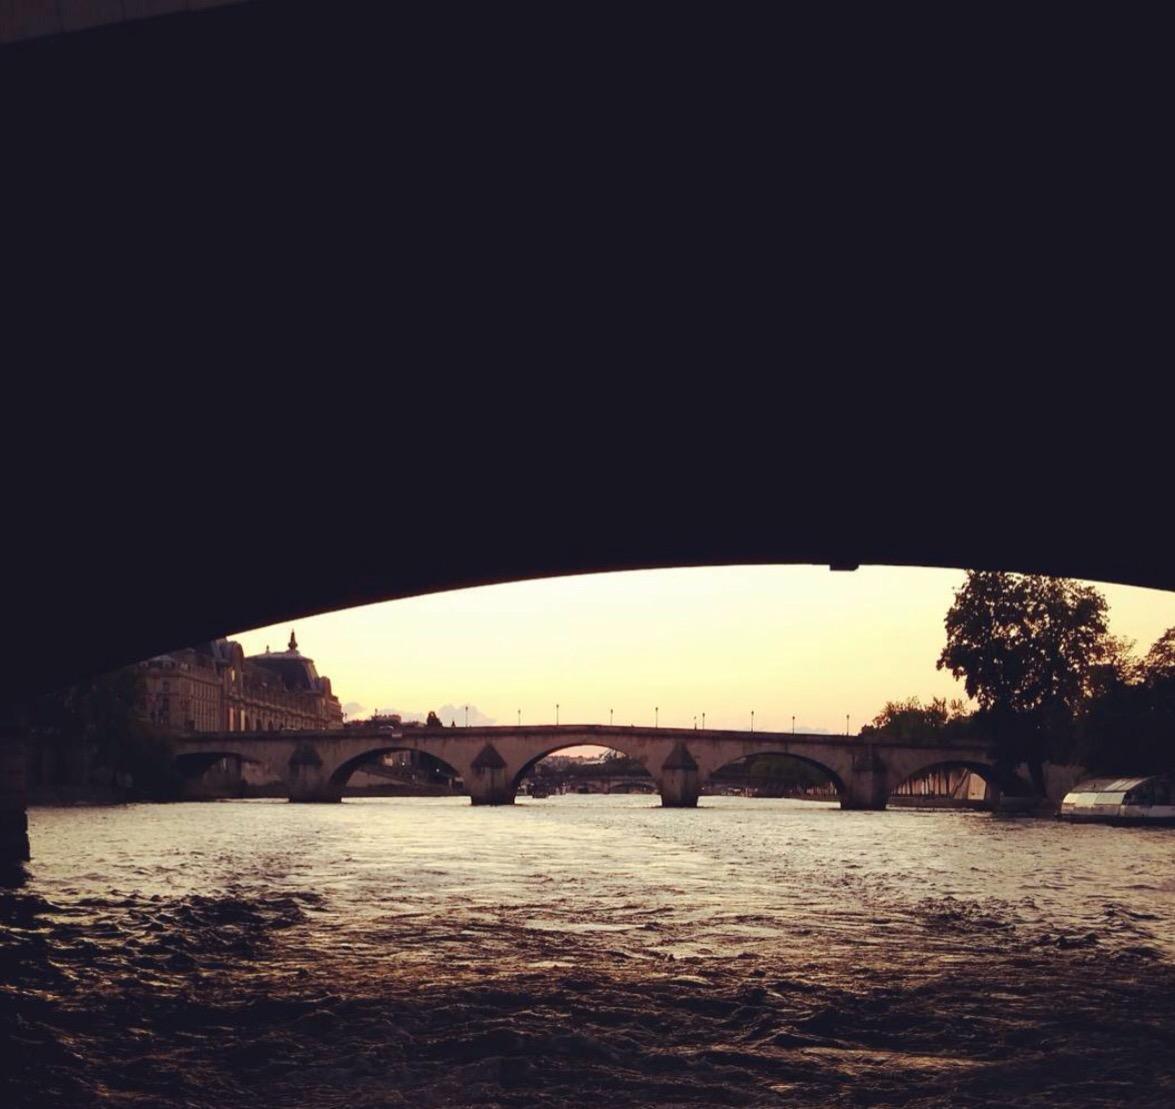 thecardiffcwtch - Paris through Instagram